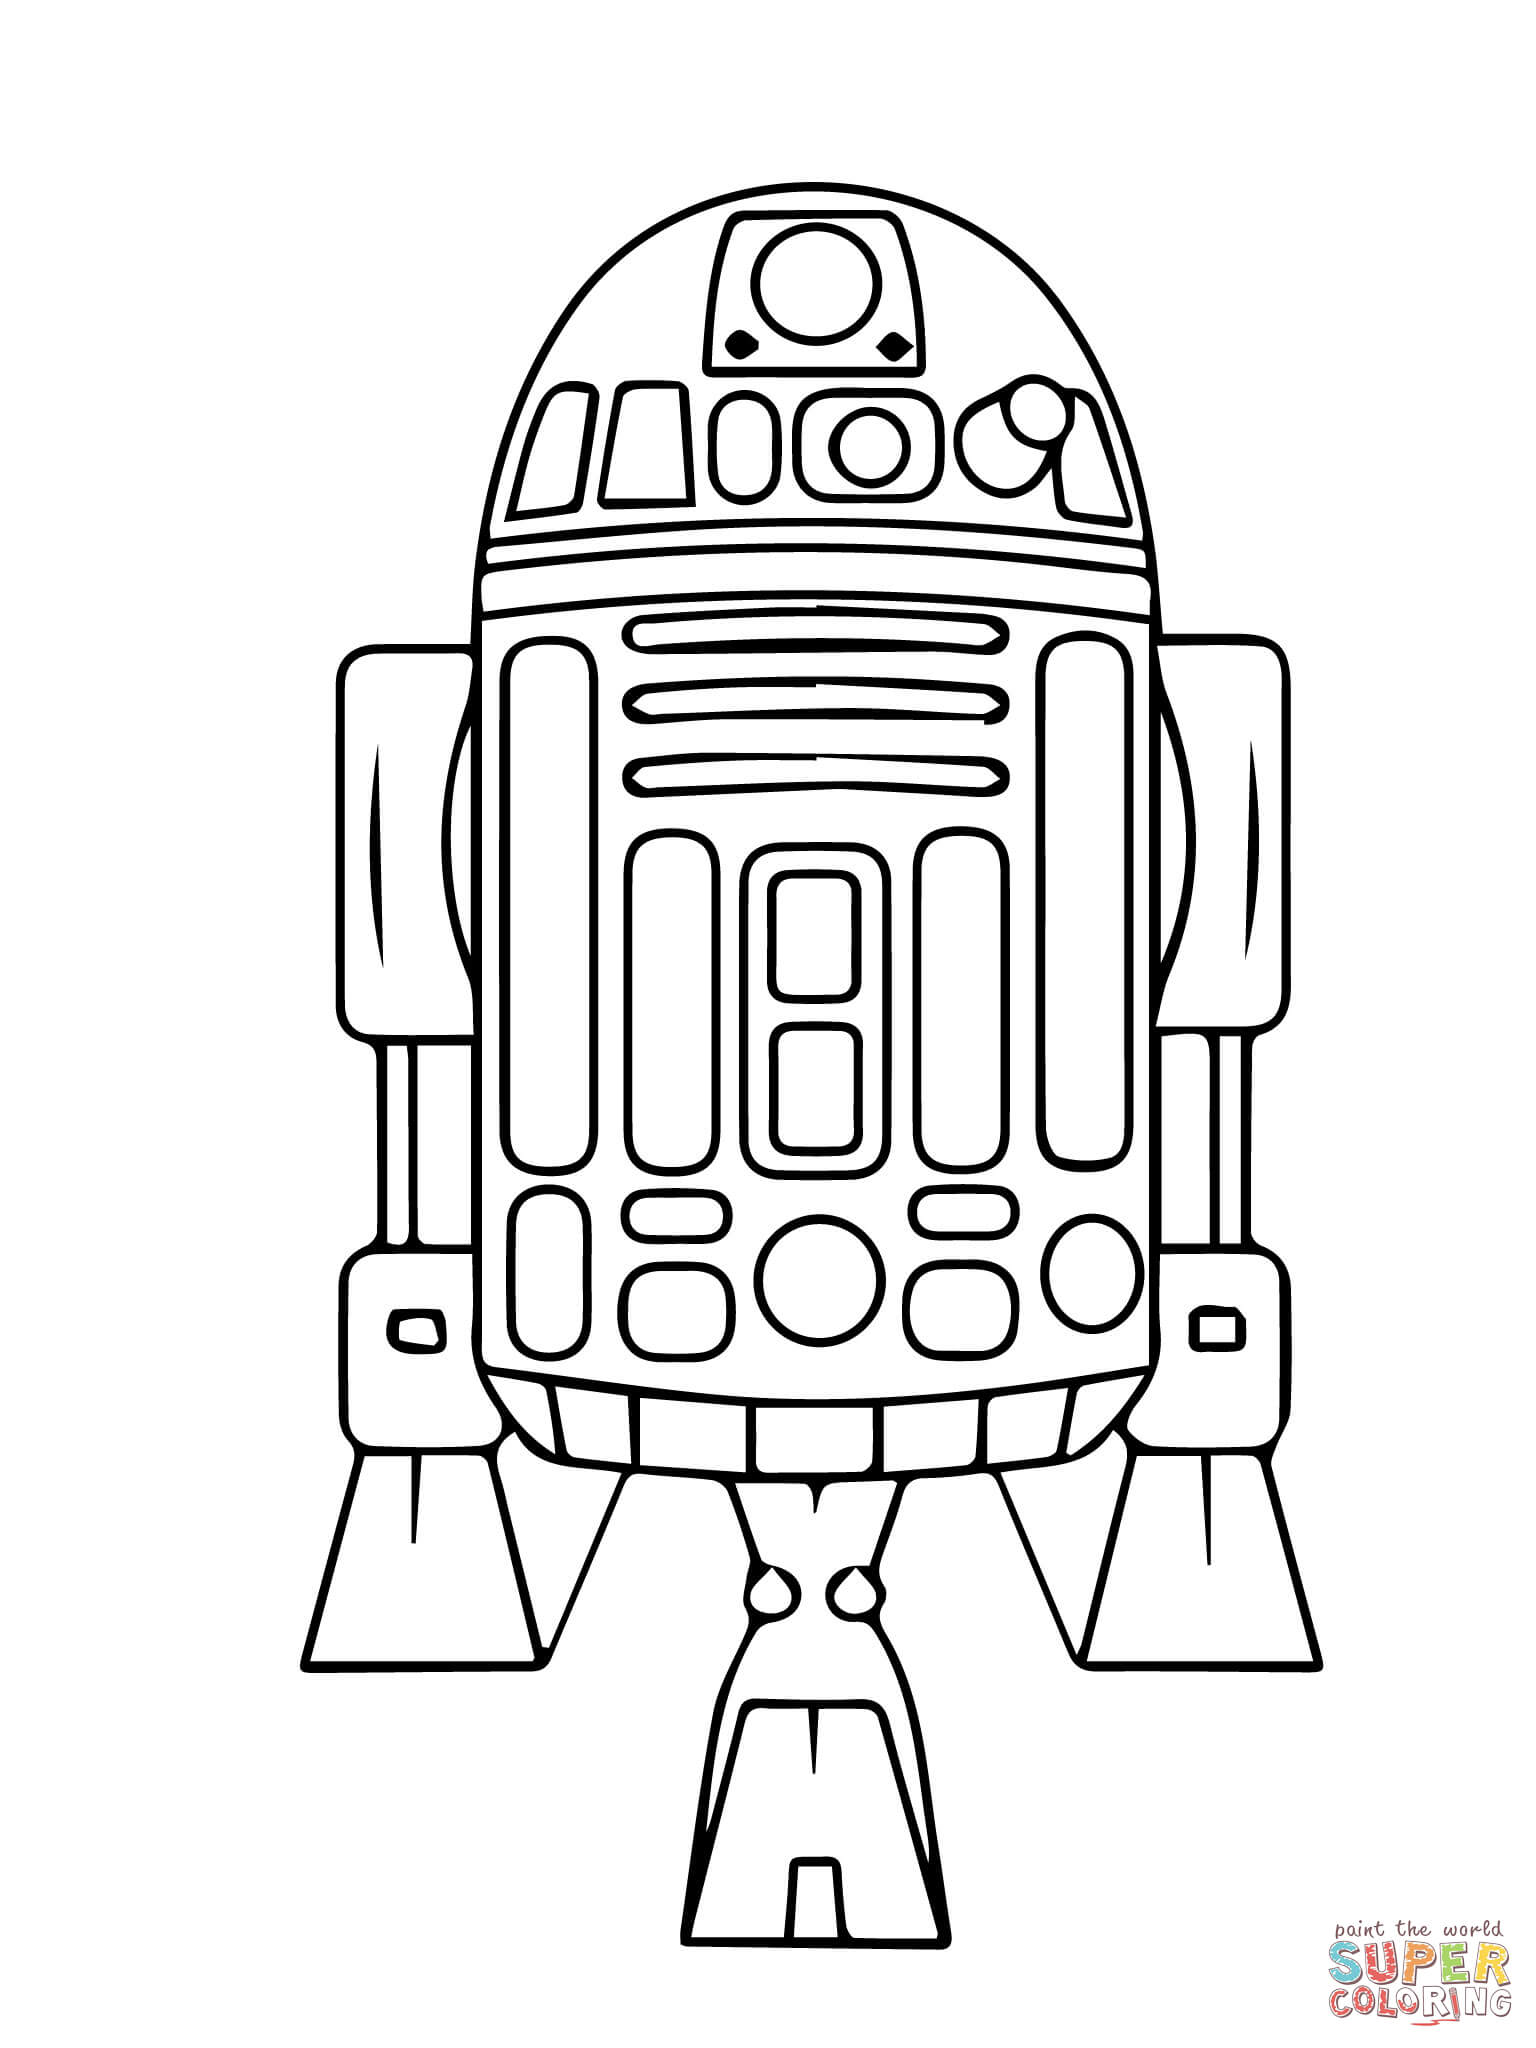 Dibujo De Droide Astromecanico R2 D2 De Star Wars La